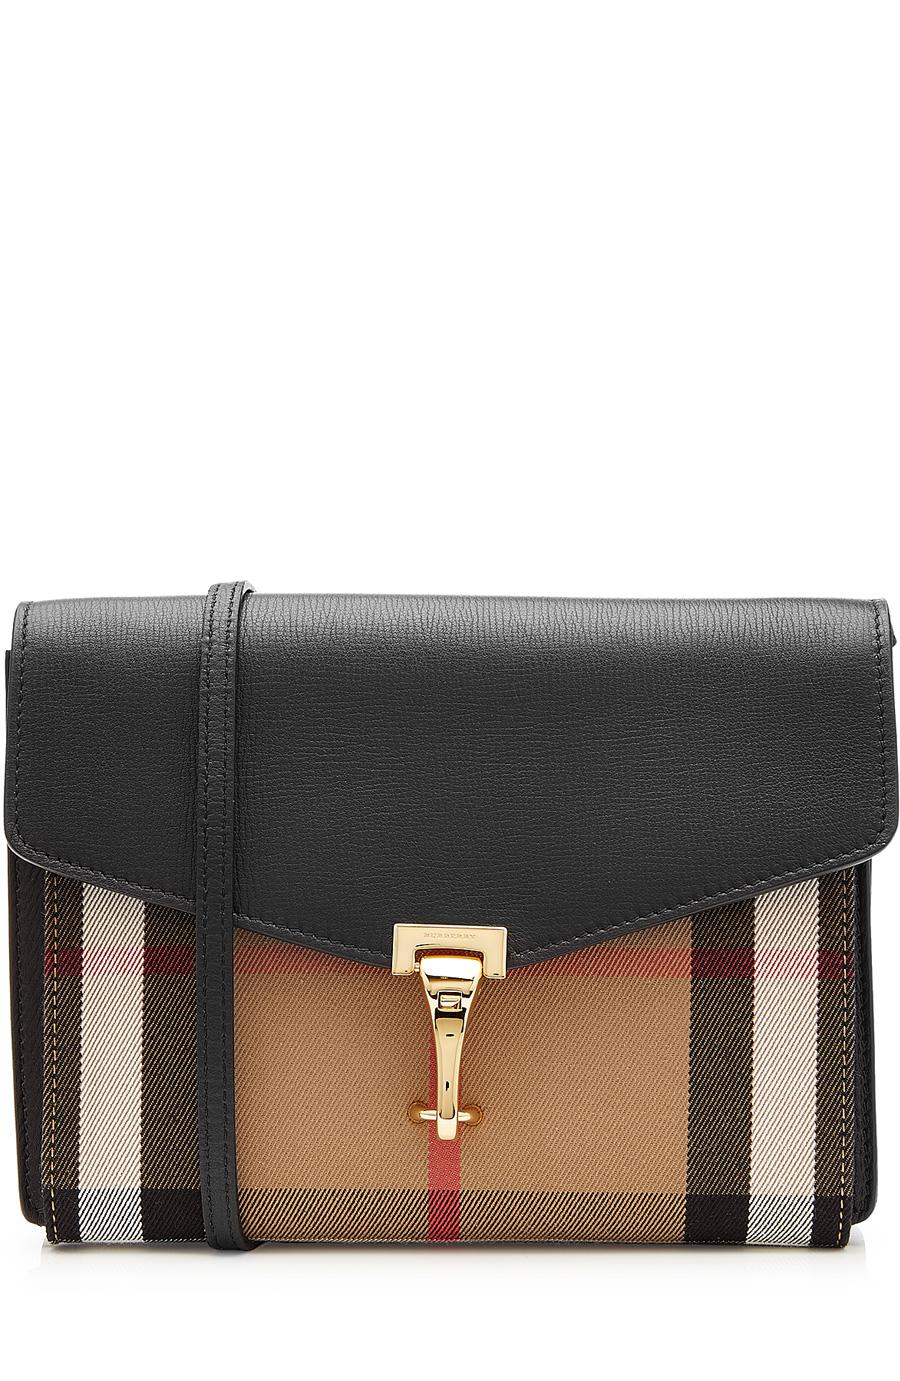 'Small Macken' House Check Crossbody Bag - Black